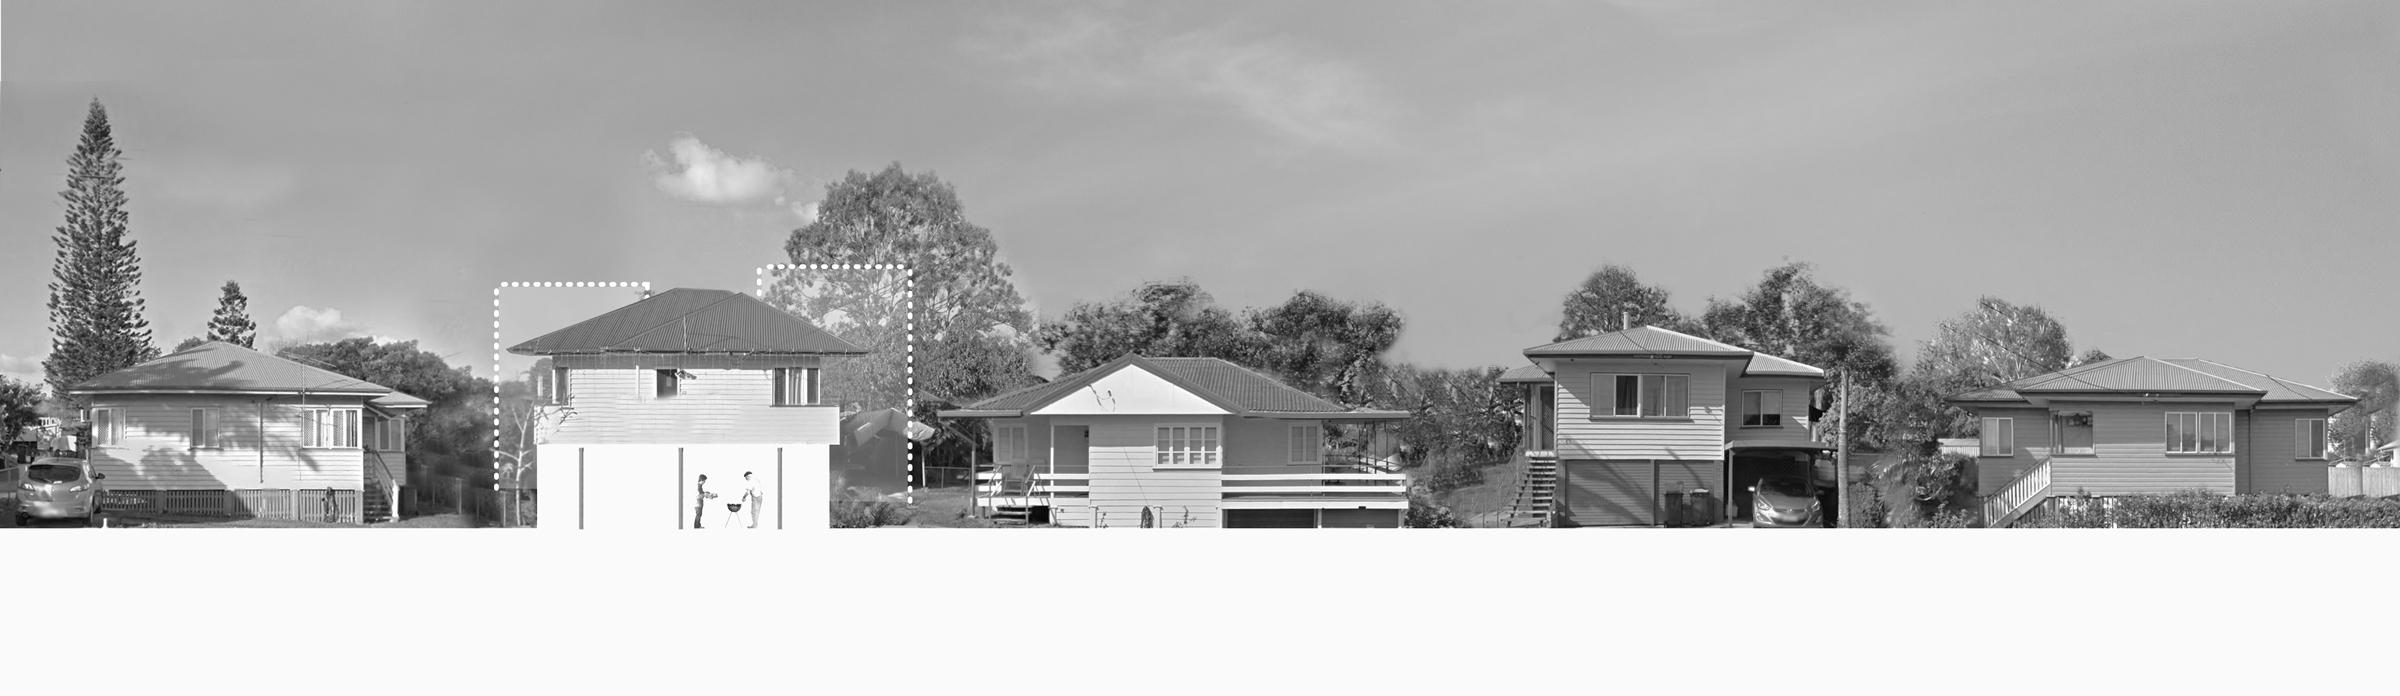 M1715-171212-Dappled Dwellings-D03B.jpg